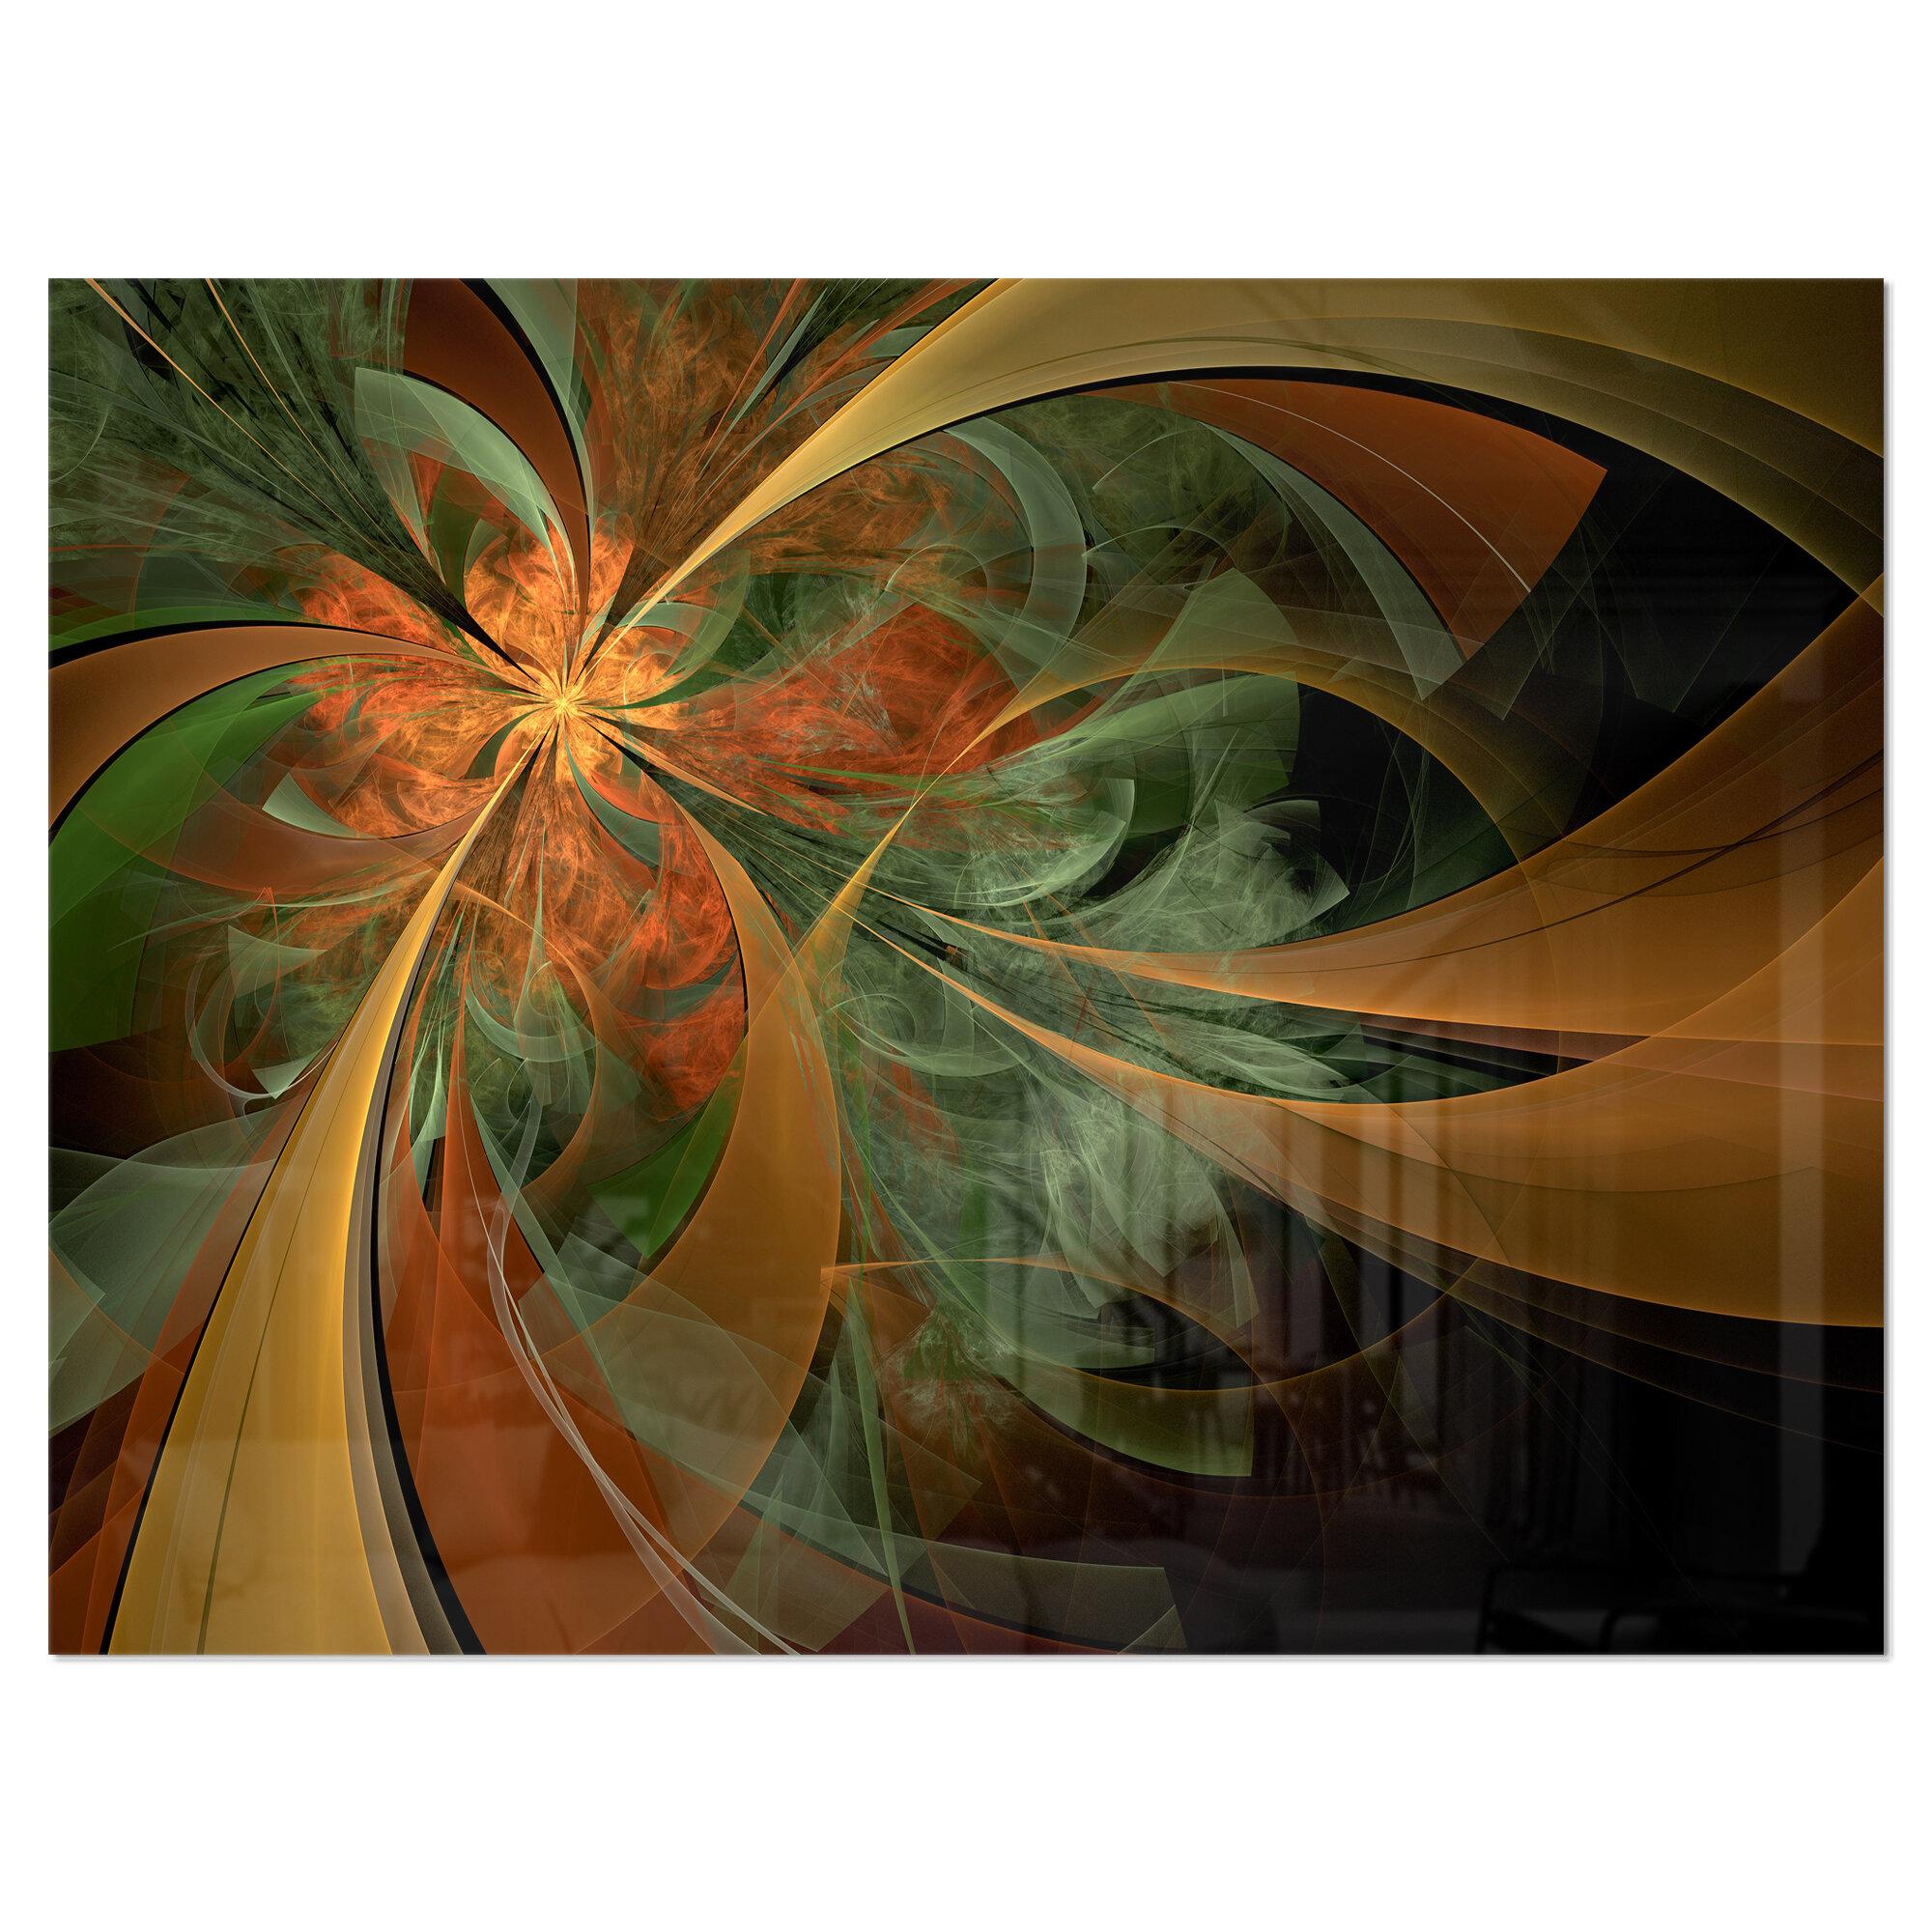 Ebern Designs Symmetrical Orange Digital Fractal Flower Graphic Art On Wrapped Canvas Reviews Wayfair